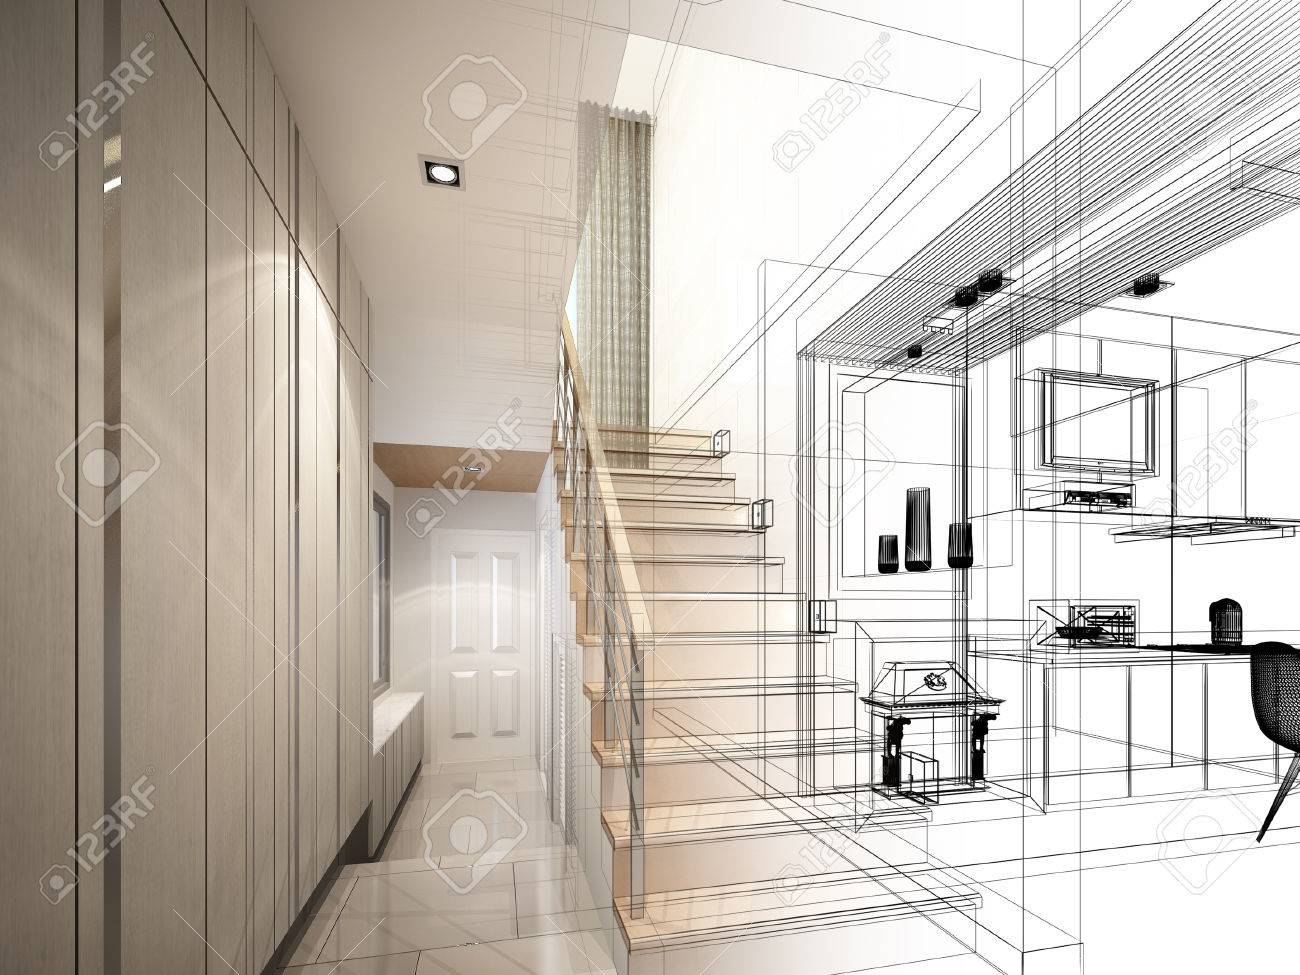 sketch design of stair hall 3dwire frame render - 40904831